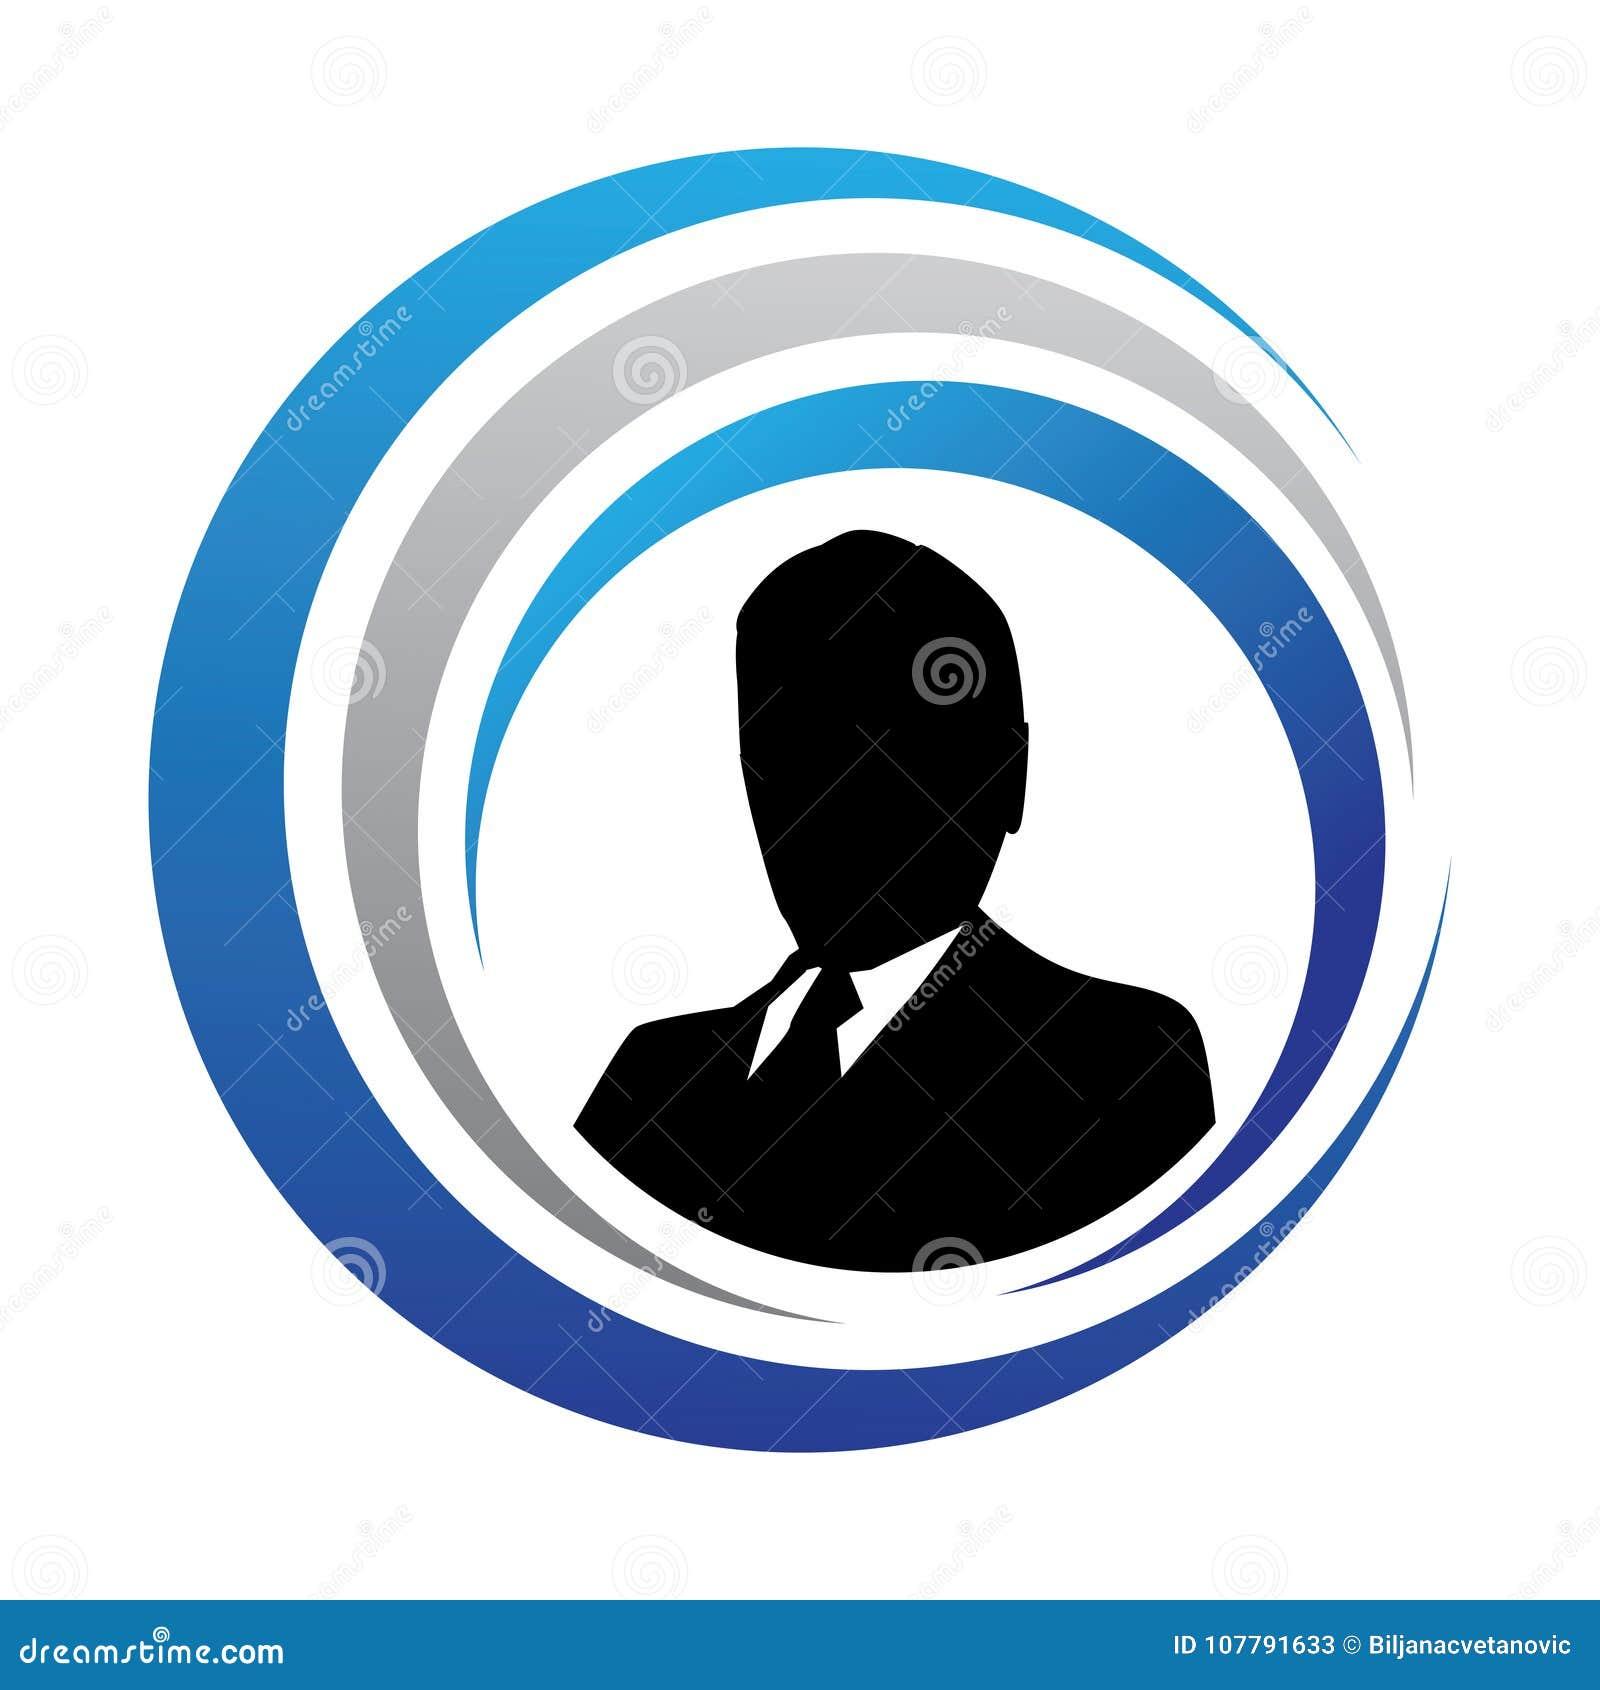 Business Manager Logo Stock Illustrations 19 433 Business Manager Logo Stock Illustrations Vectors Clipart Dreamstime